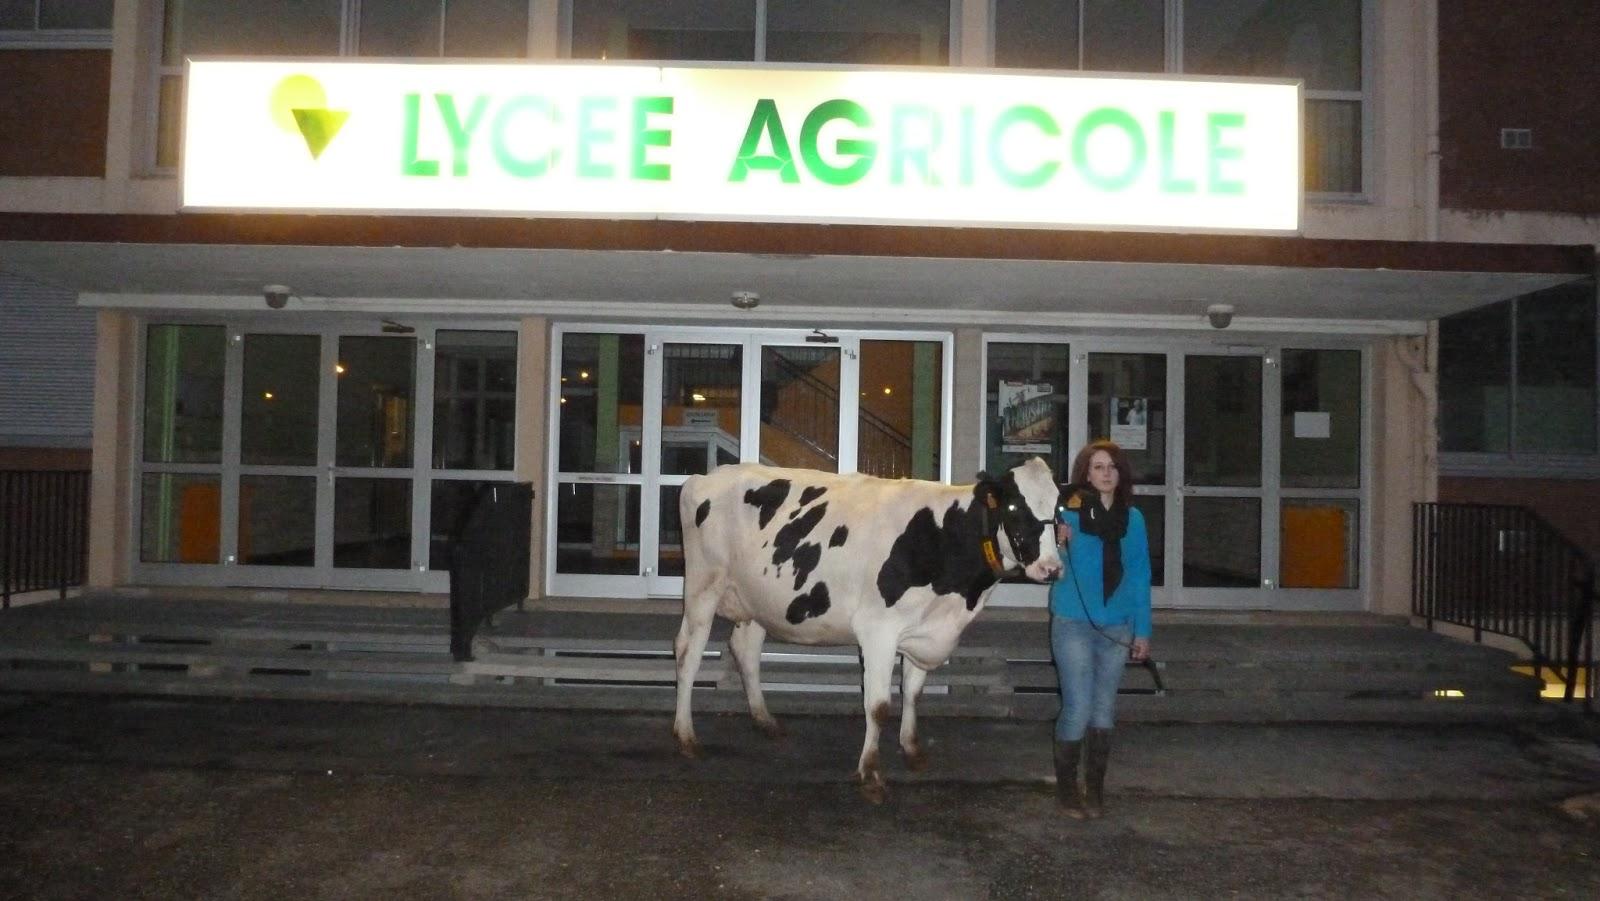 Legta de rethel come back to paris mission tnla 2013 - Salon del agriculture ...